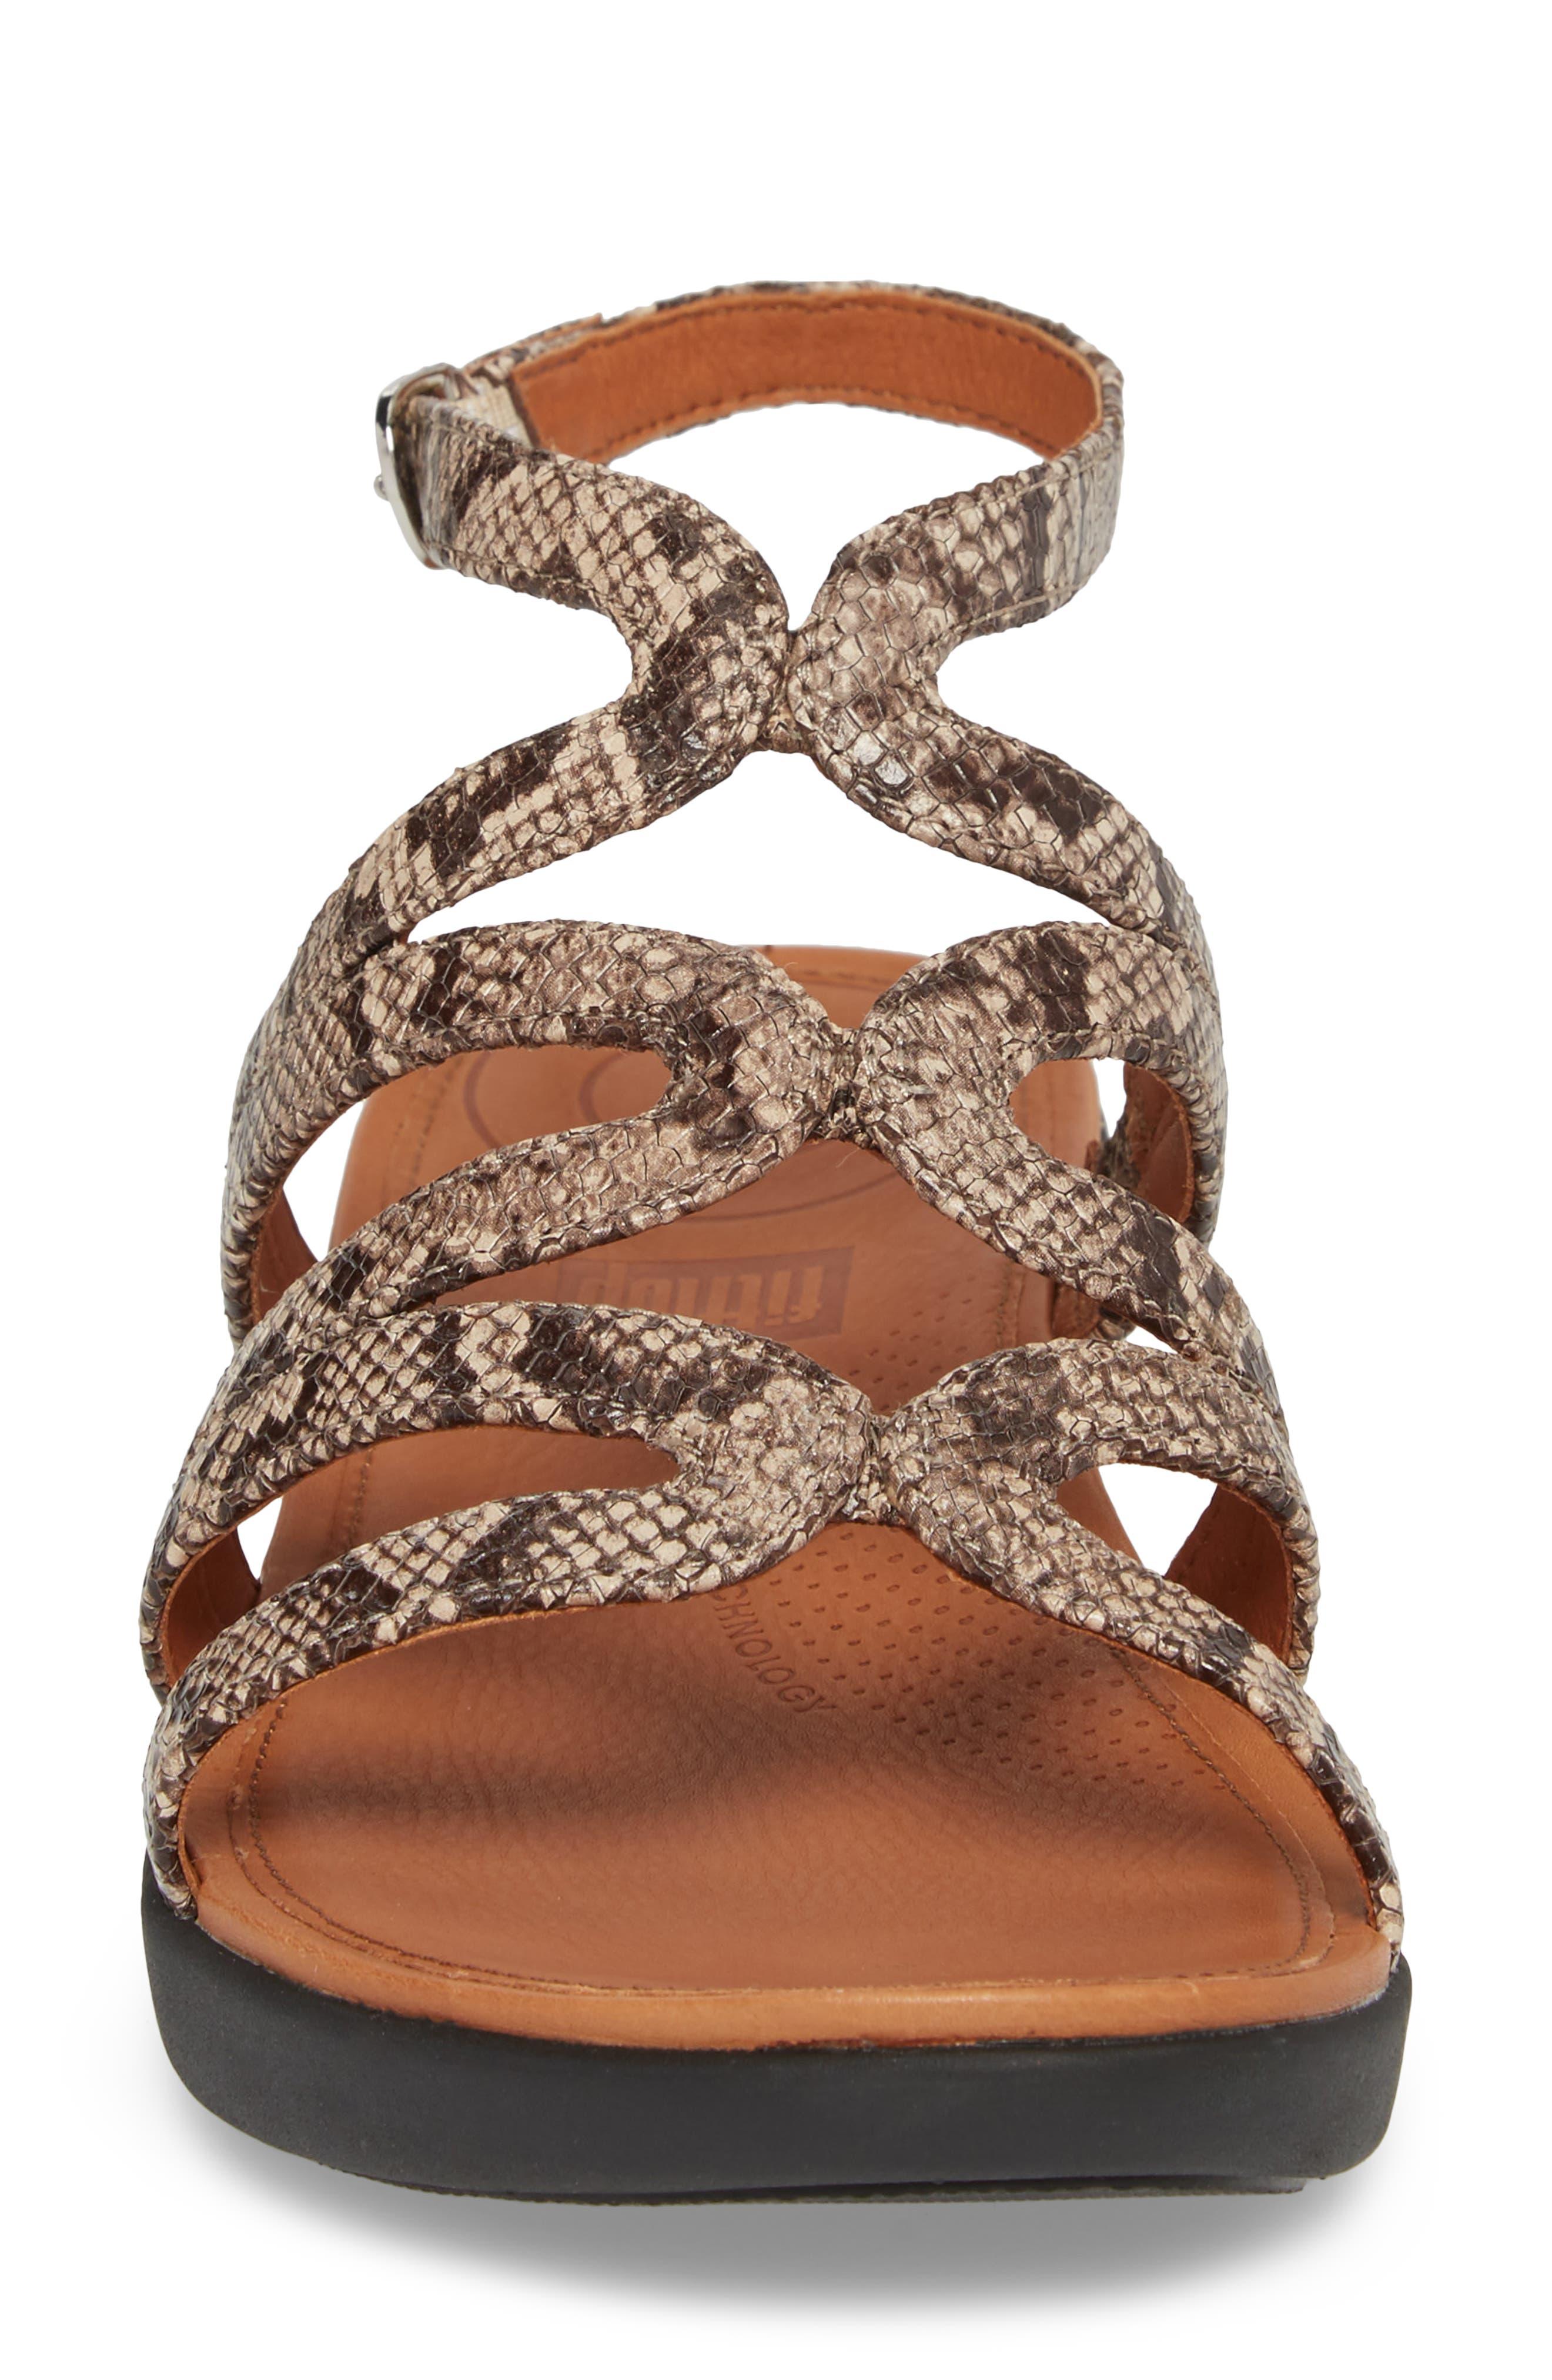 Strata Gladiator Sandal,                             Alternate thumbnail 4, color,                             Taupe Snake Print Leather